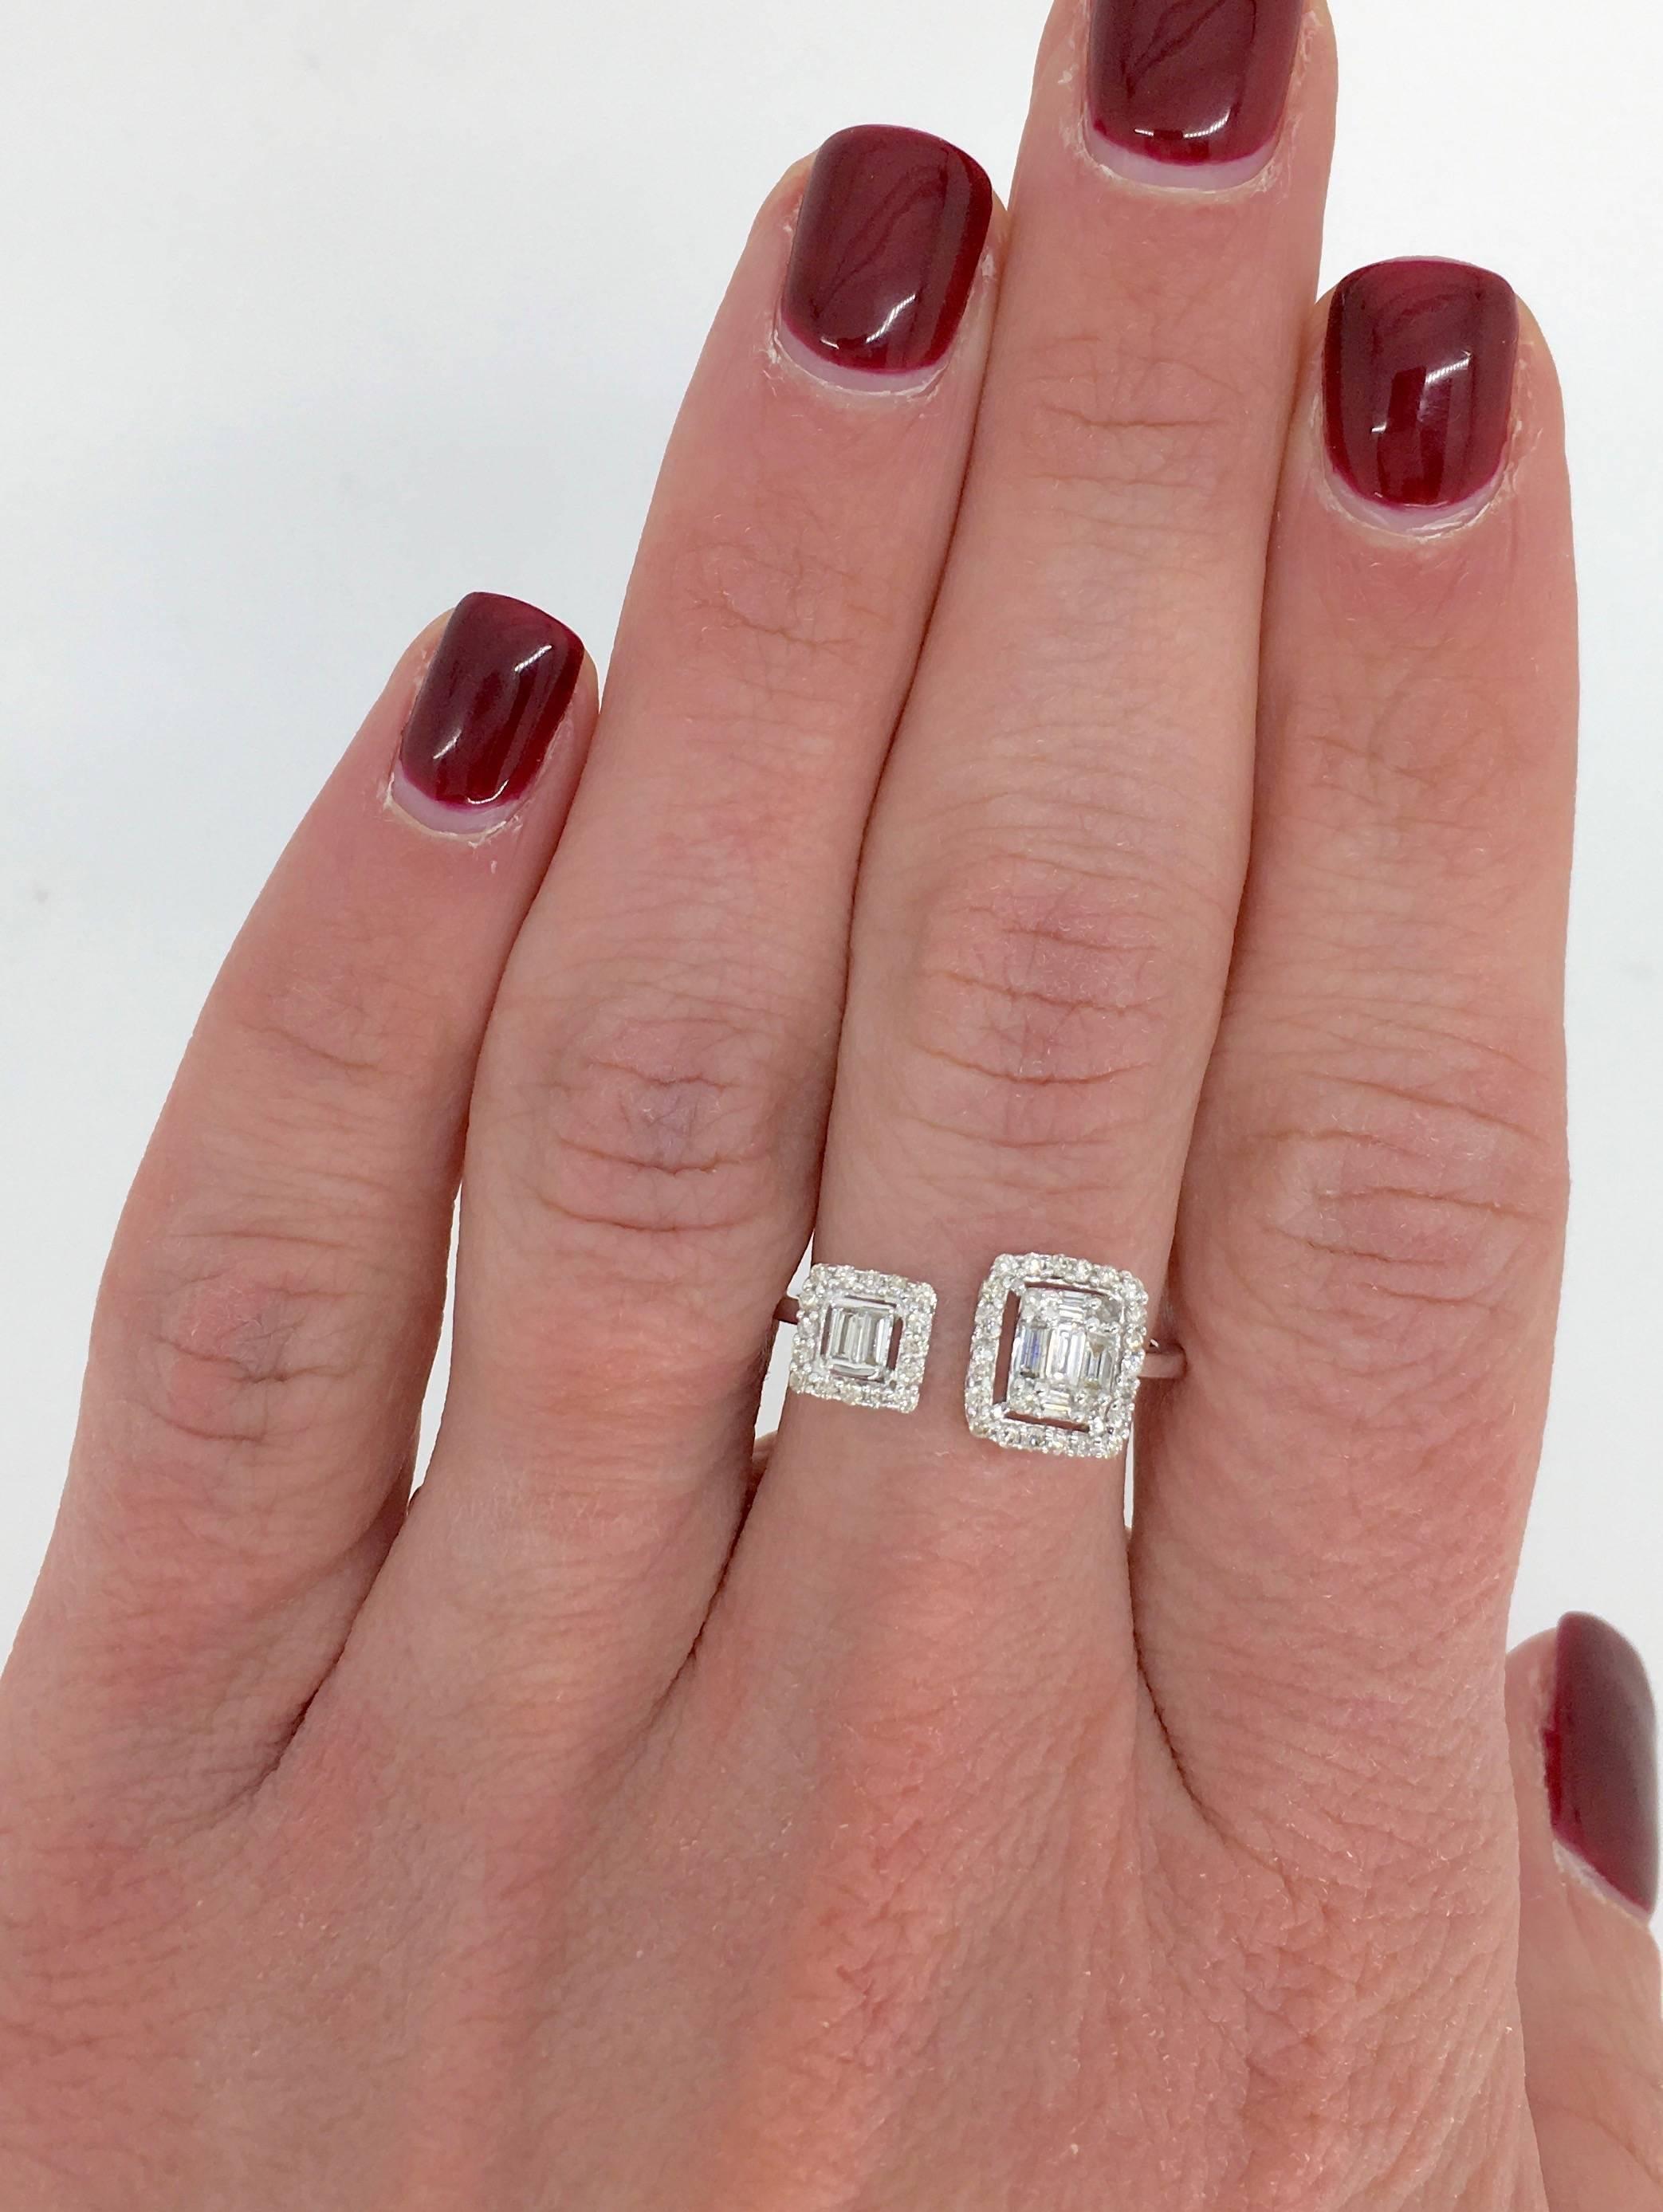 18 Karat White Gold Bypass Diamond Ring For Sale at 1stdibs